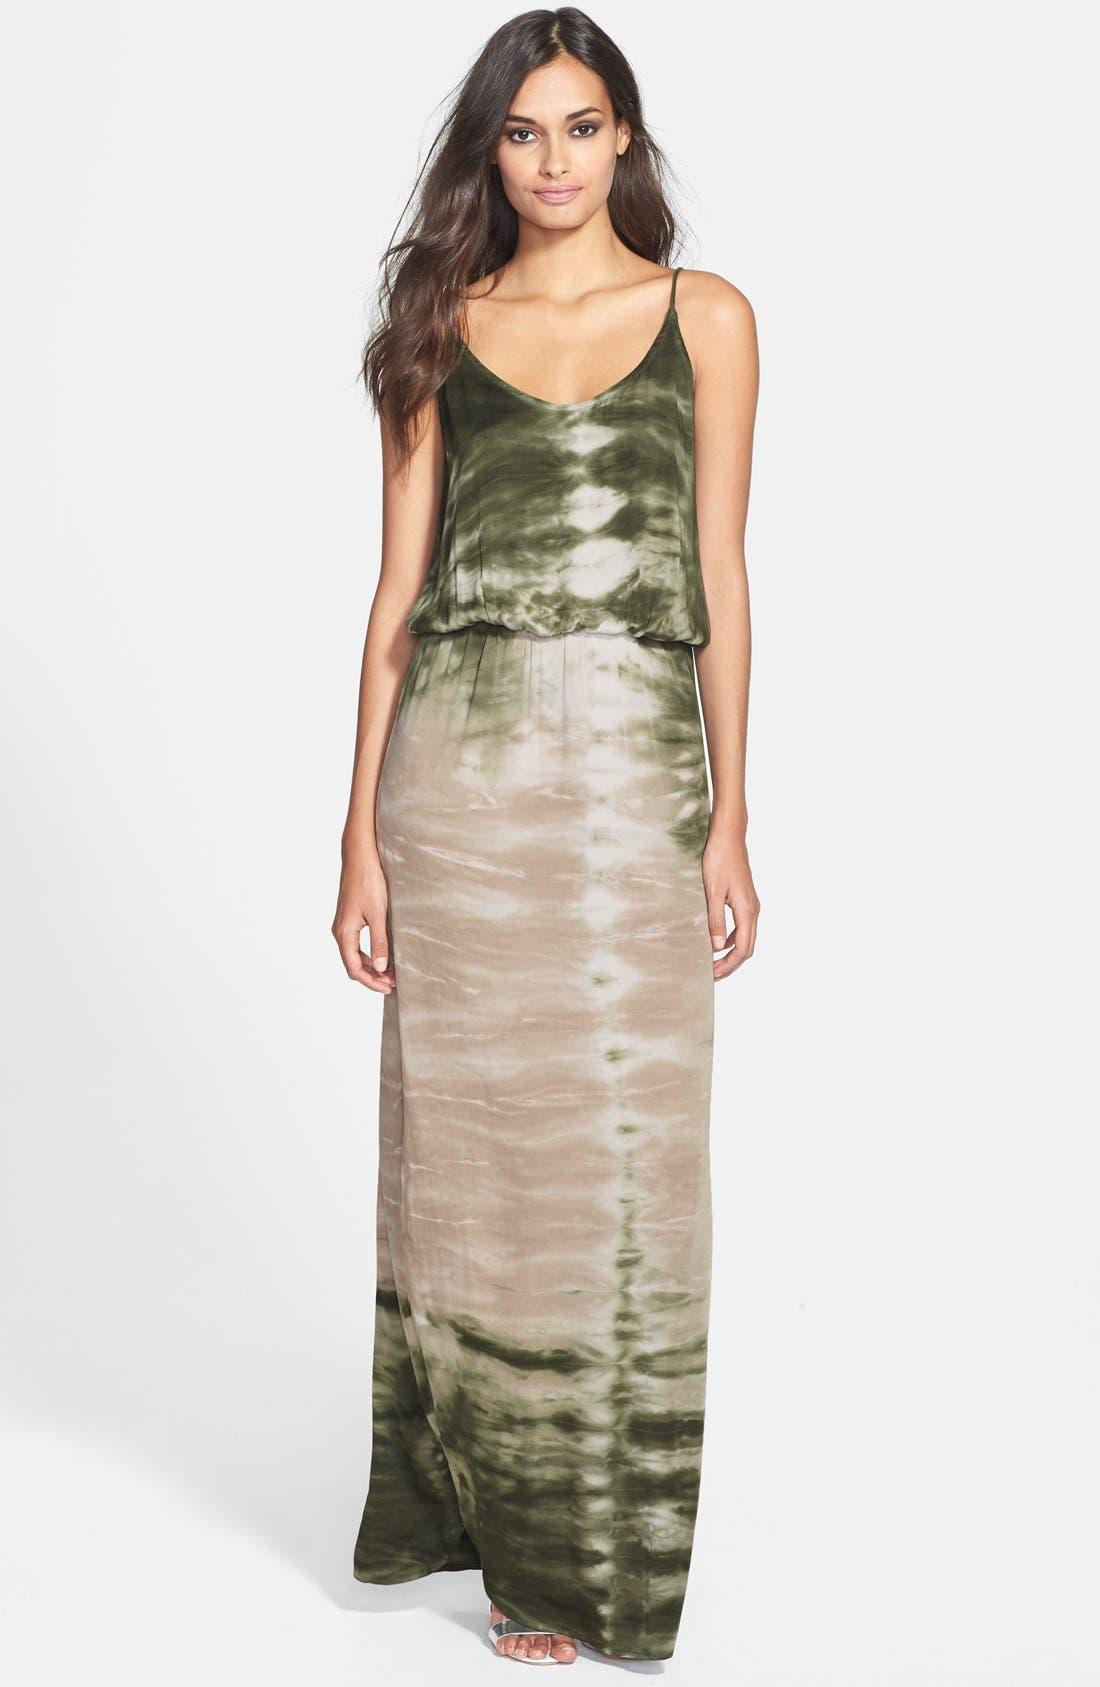 Alternate Image 1 Selected - Young, Fabulous & Broke 'Holland' Tie Dye Maxi Dress